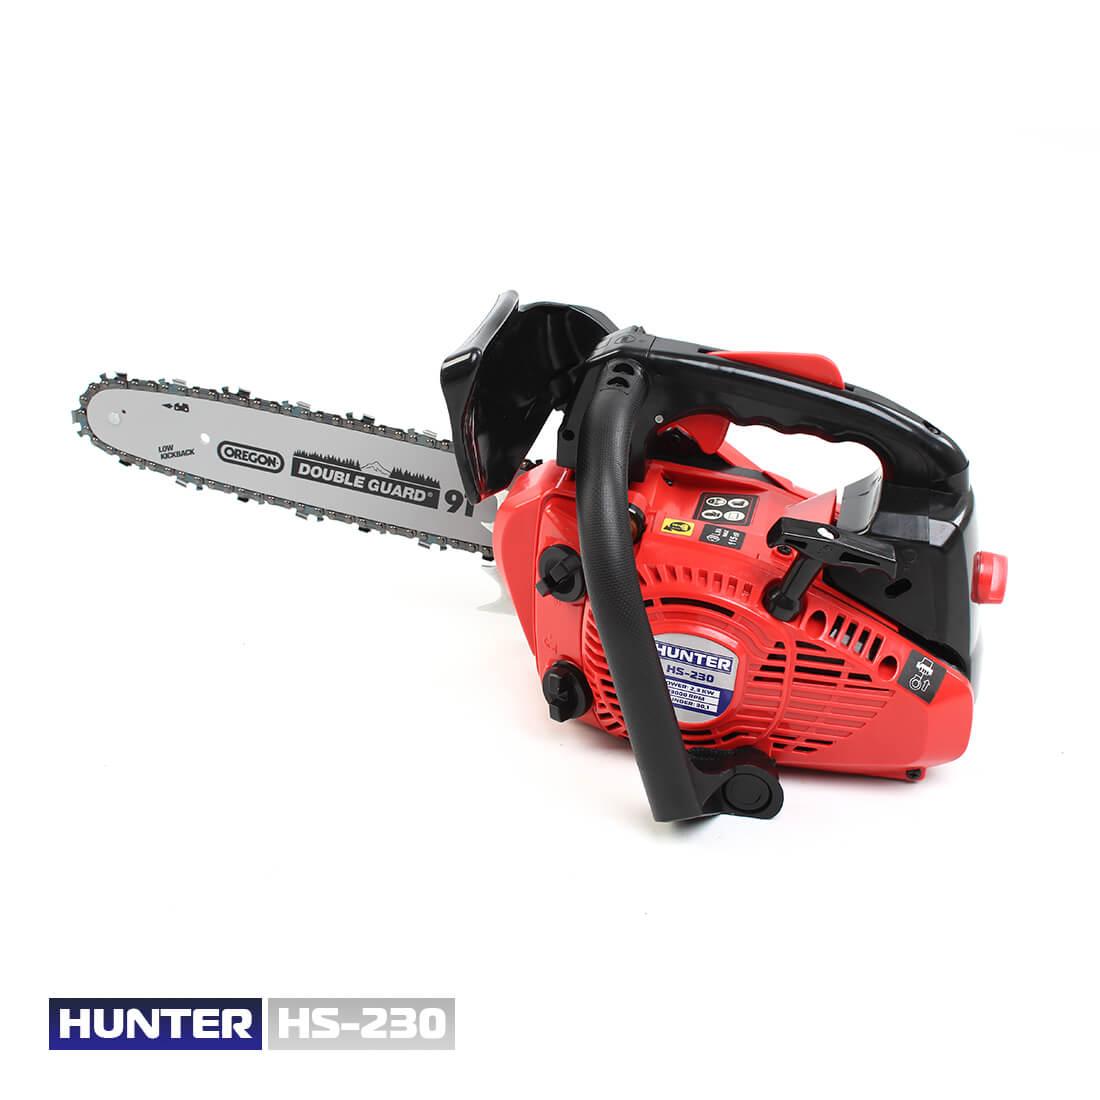 Фото Hunter HS-230 цена 3470грн №6 — Hunter